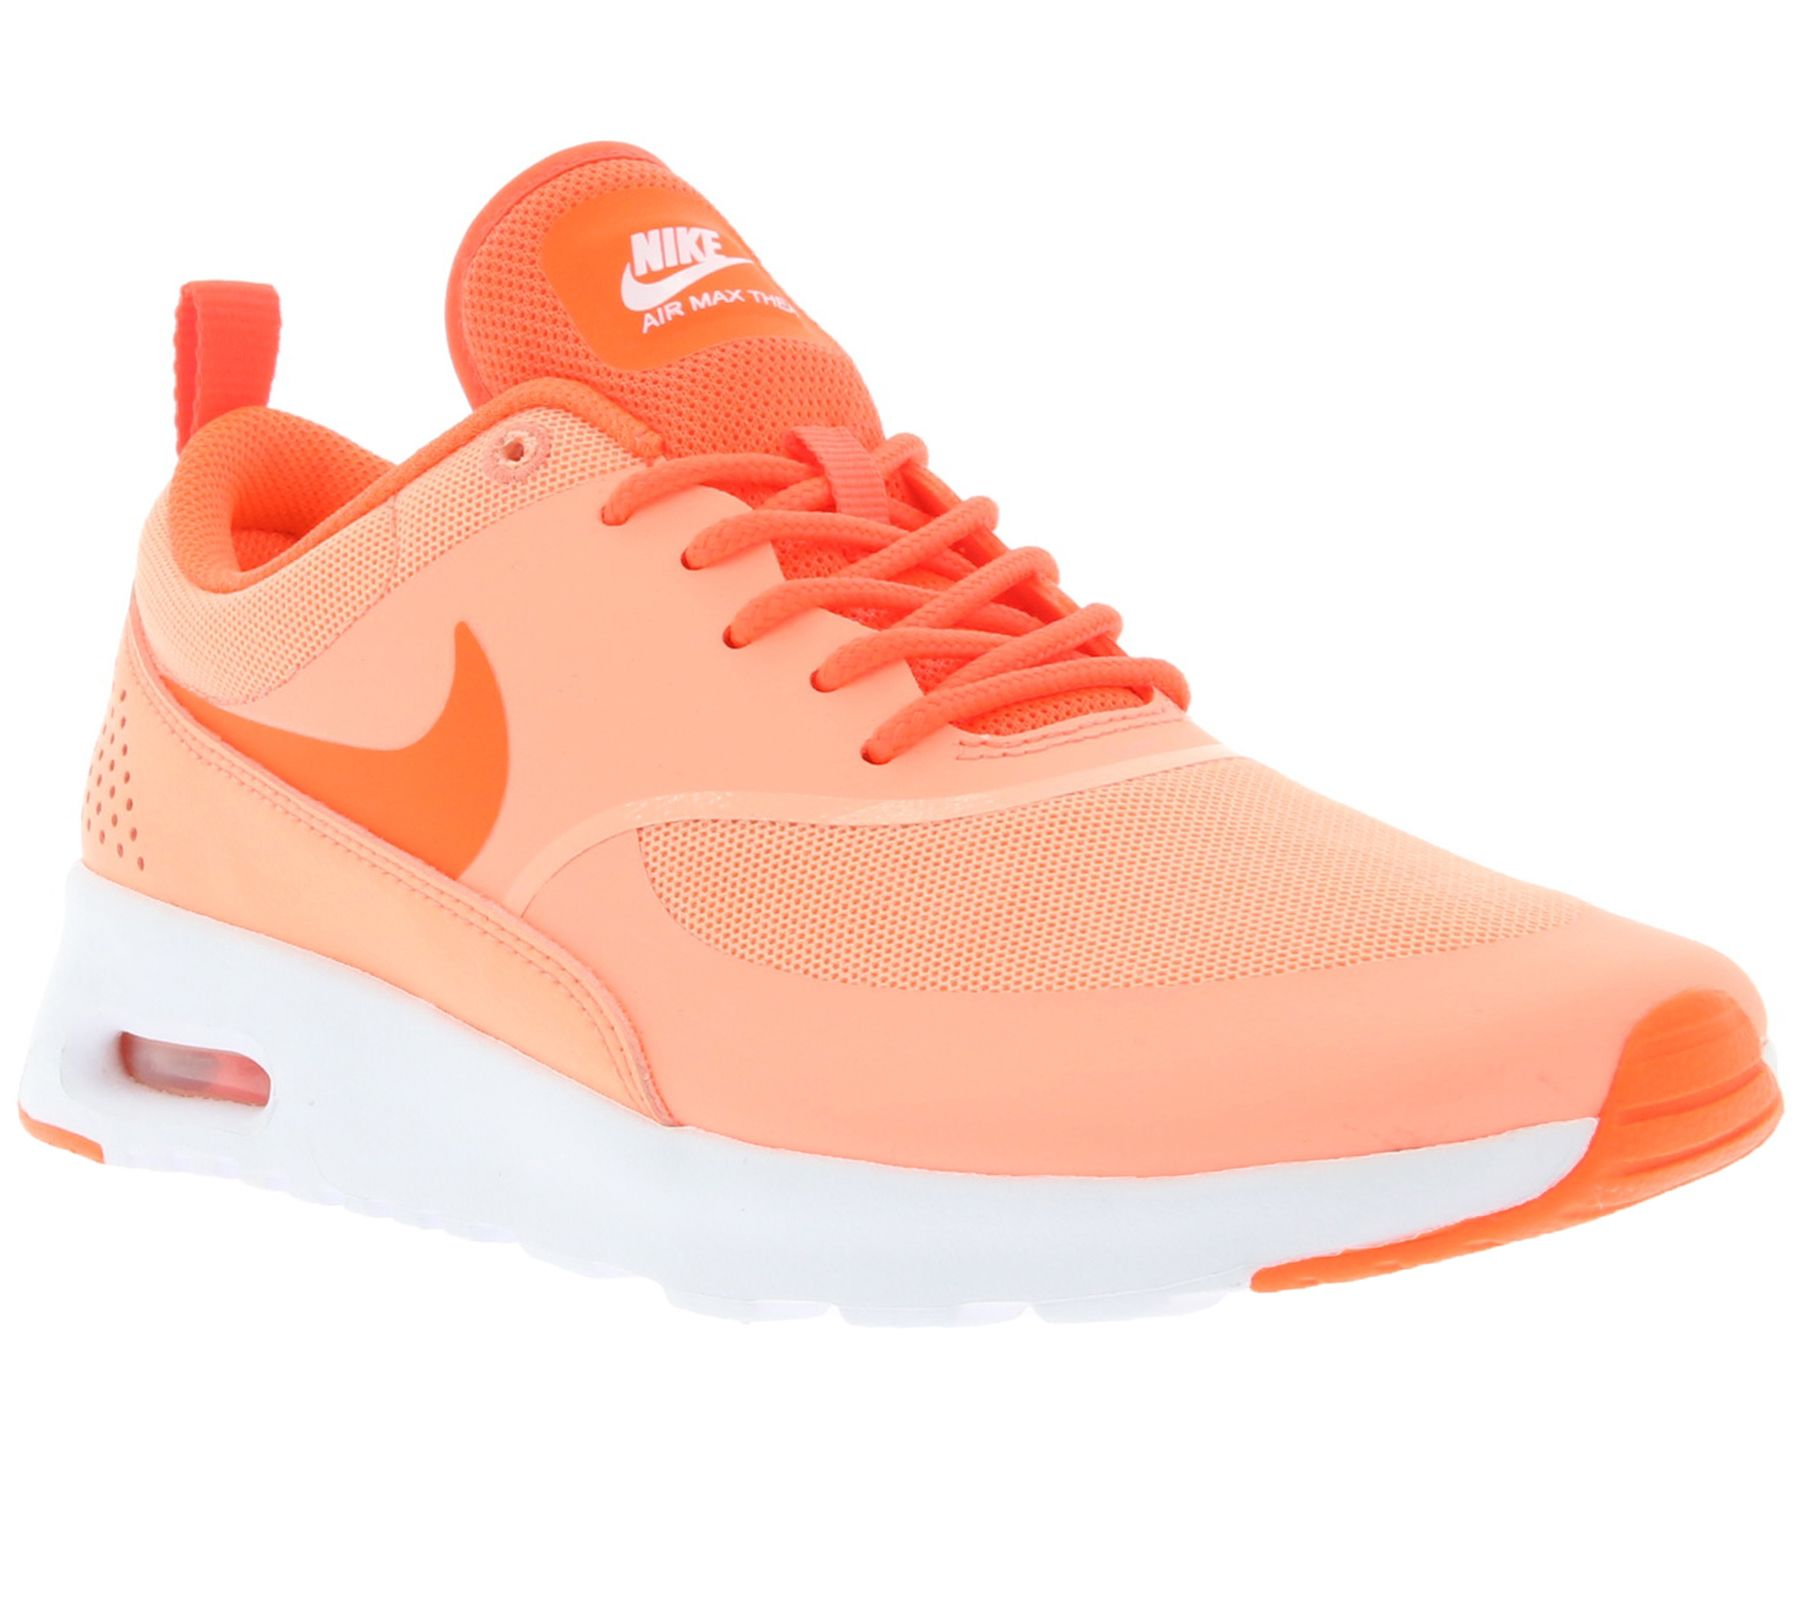 NIKE Air Max Thea WMNS Damen Sneaker Pink 599409 608 günstig